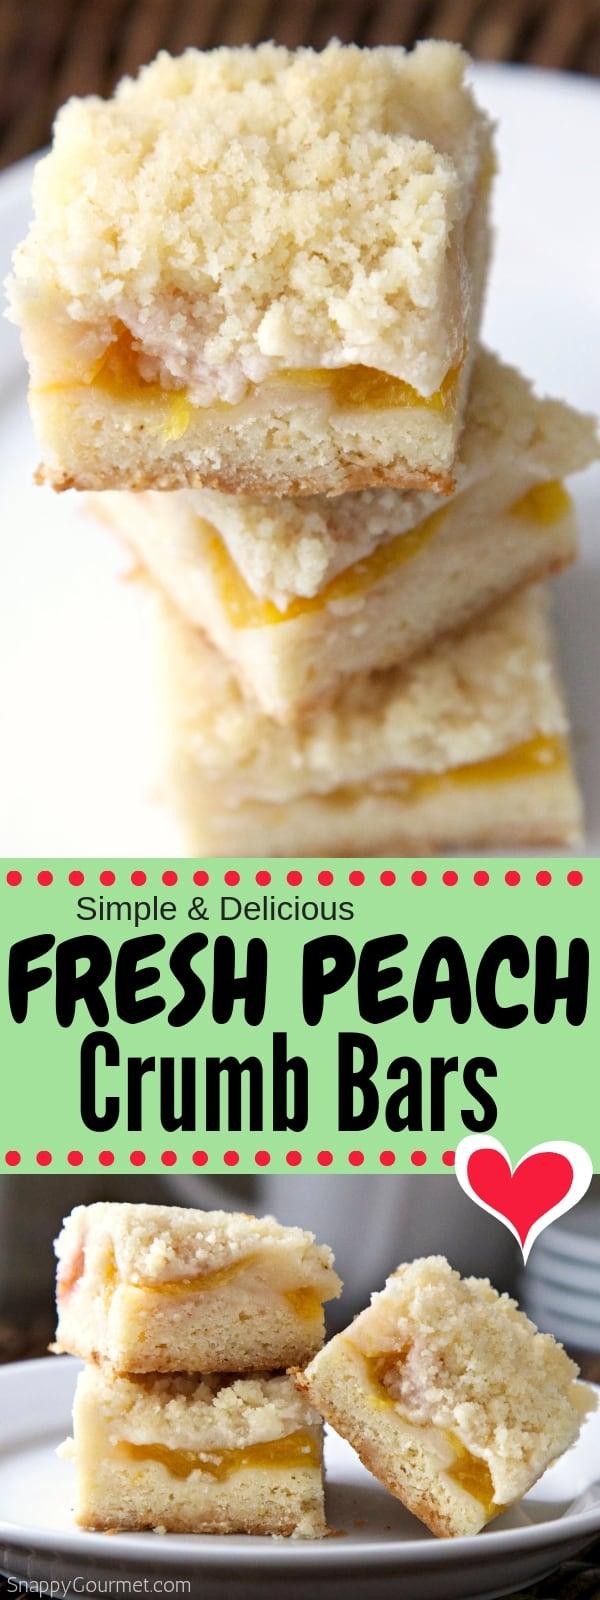 Peach Crumb Bars photo collage